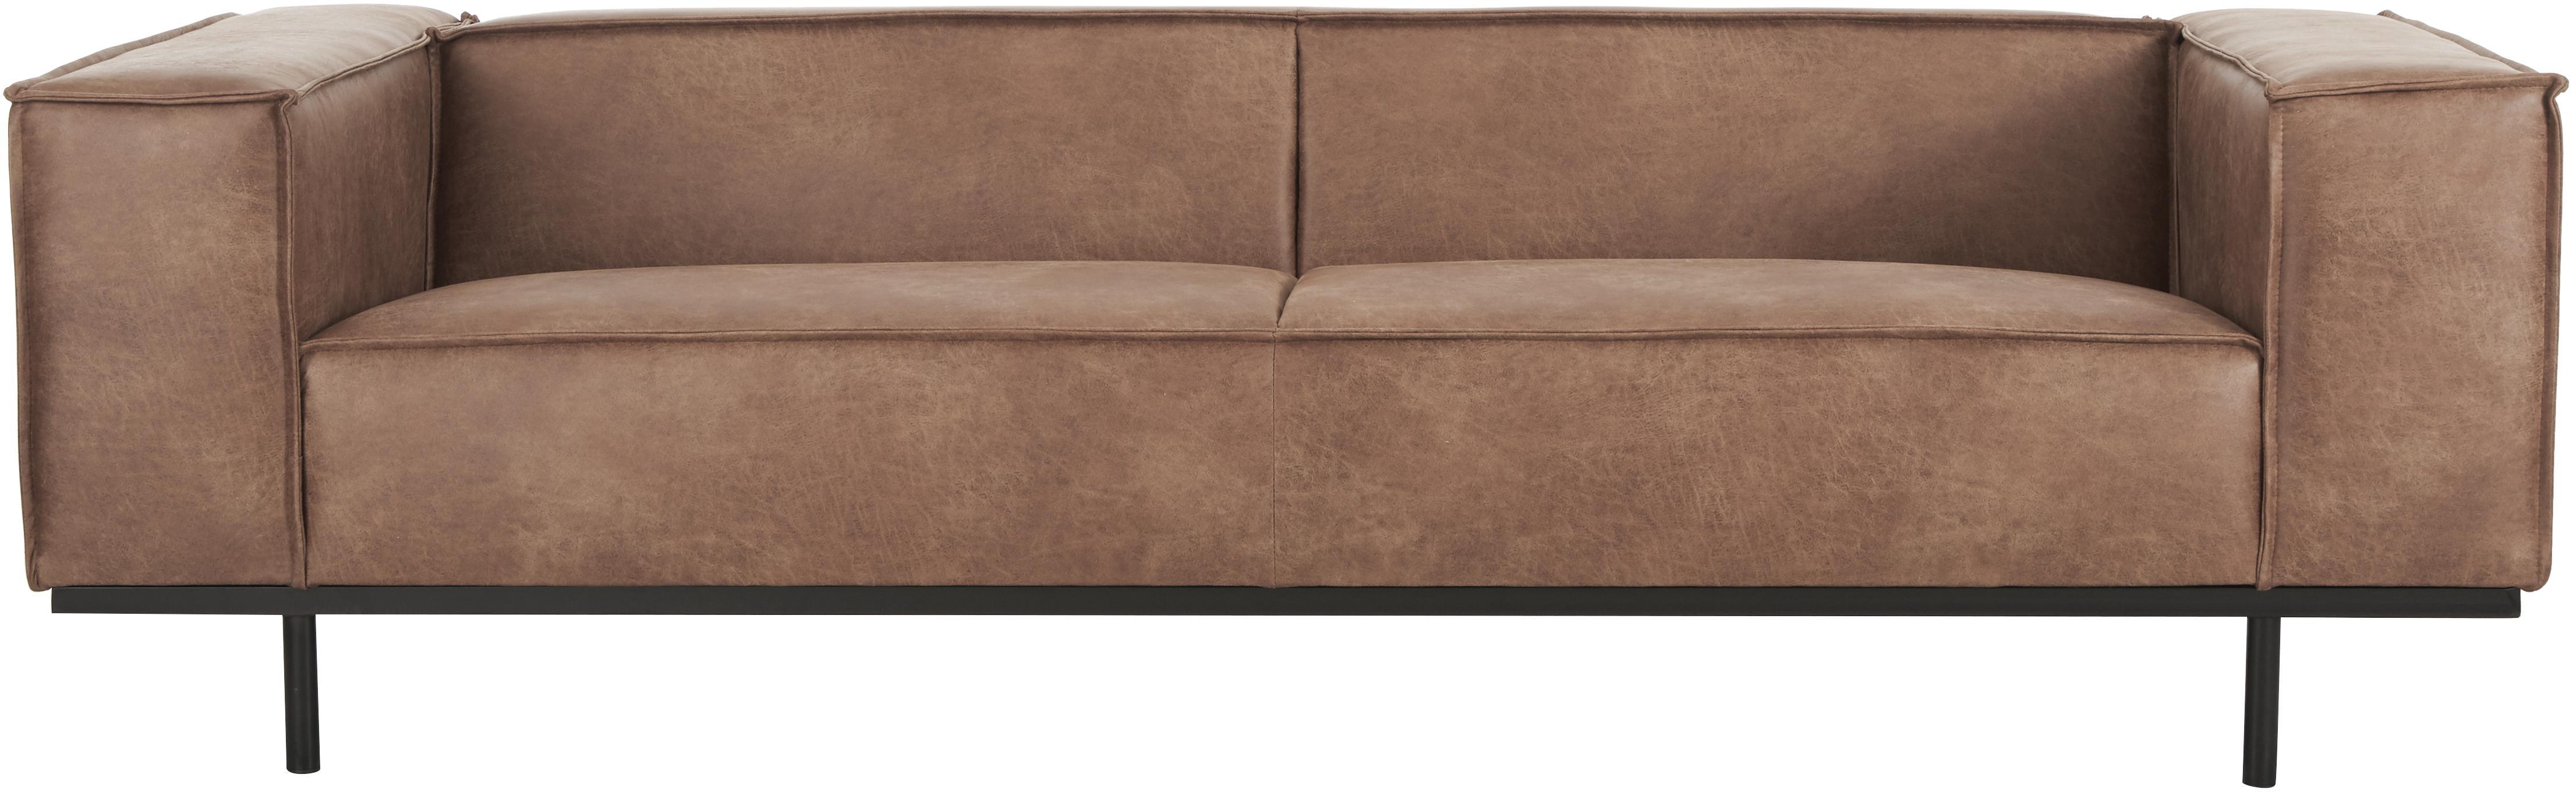 Sofá Abigail (3plazas), Tapizado: fibras de cuero (70%cuer, Patas: acero, pintado, Marrón, An 230 x F 95 cm